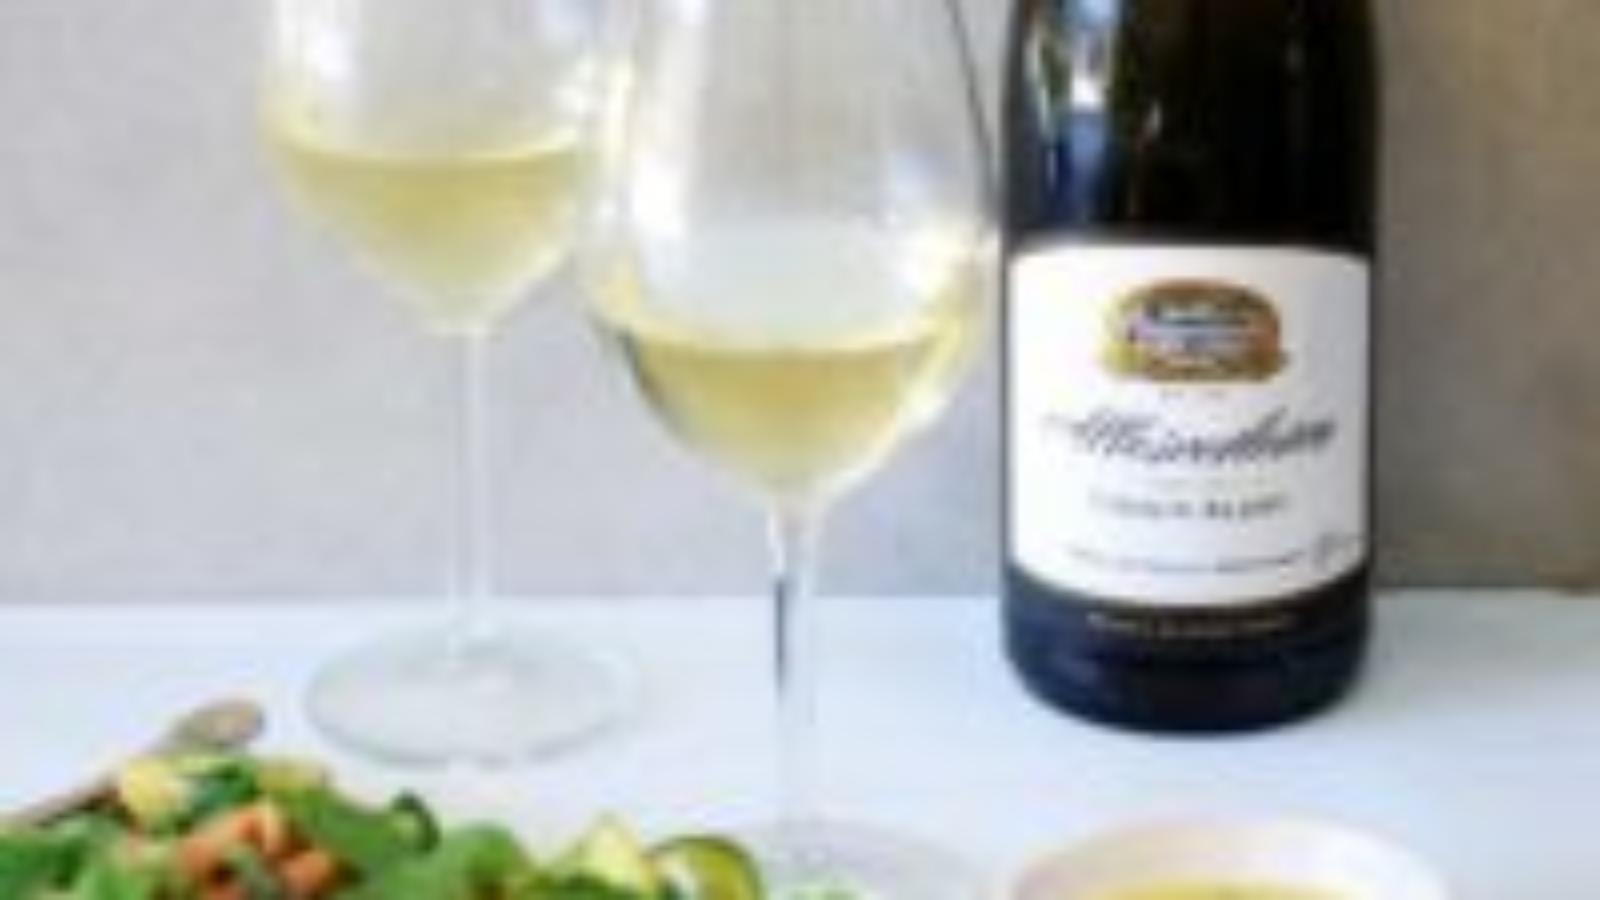 Allesverloren-Chenin-Blanc-with-food-IMG_3978-200x300